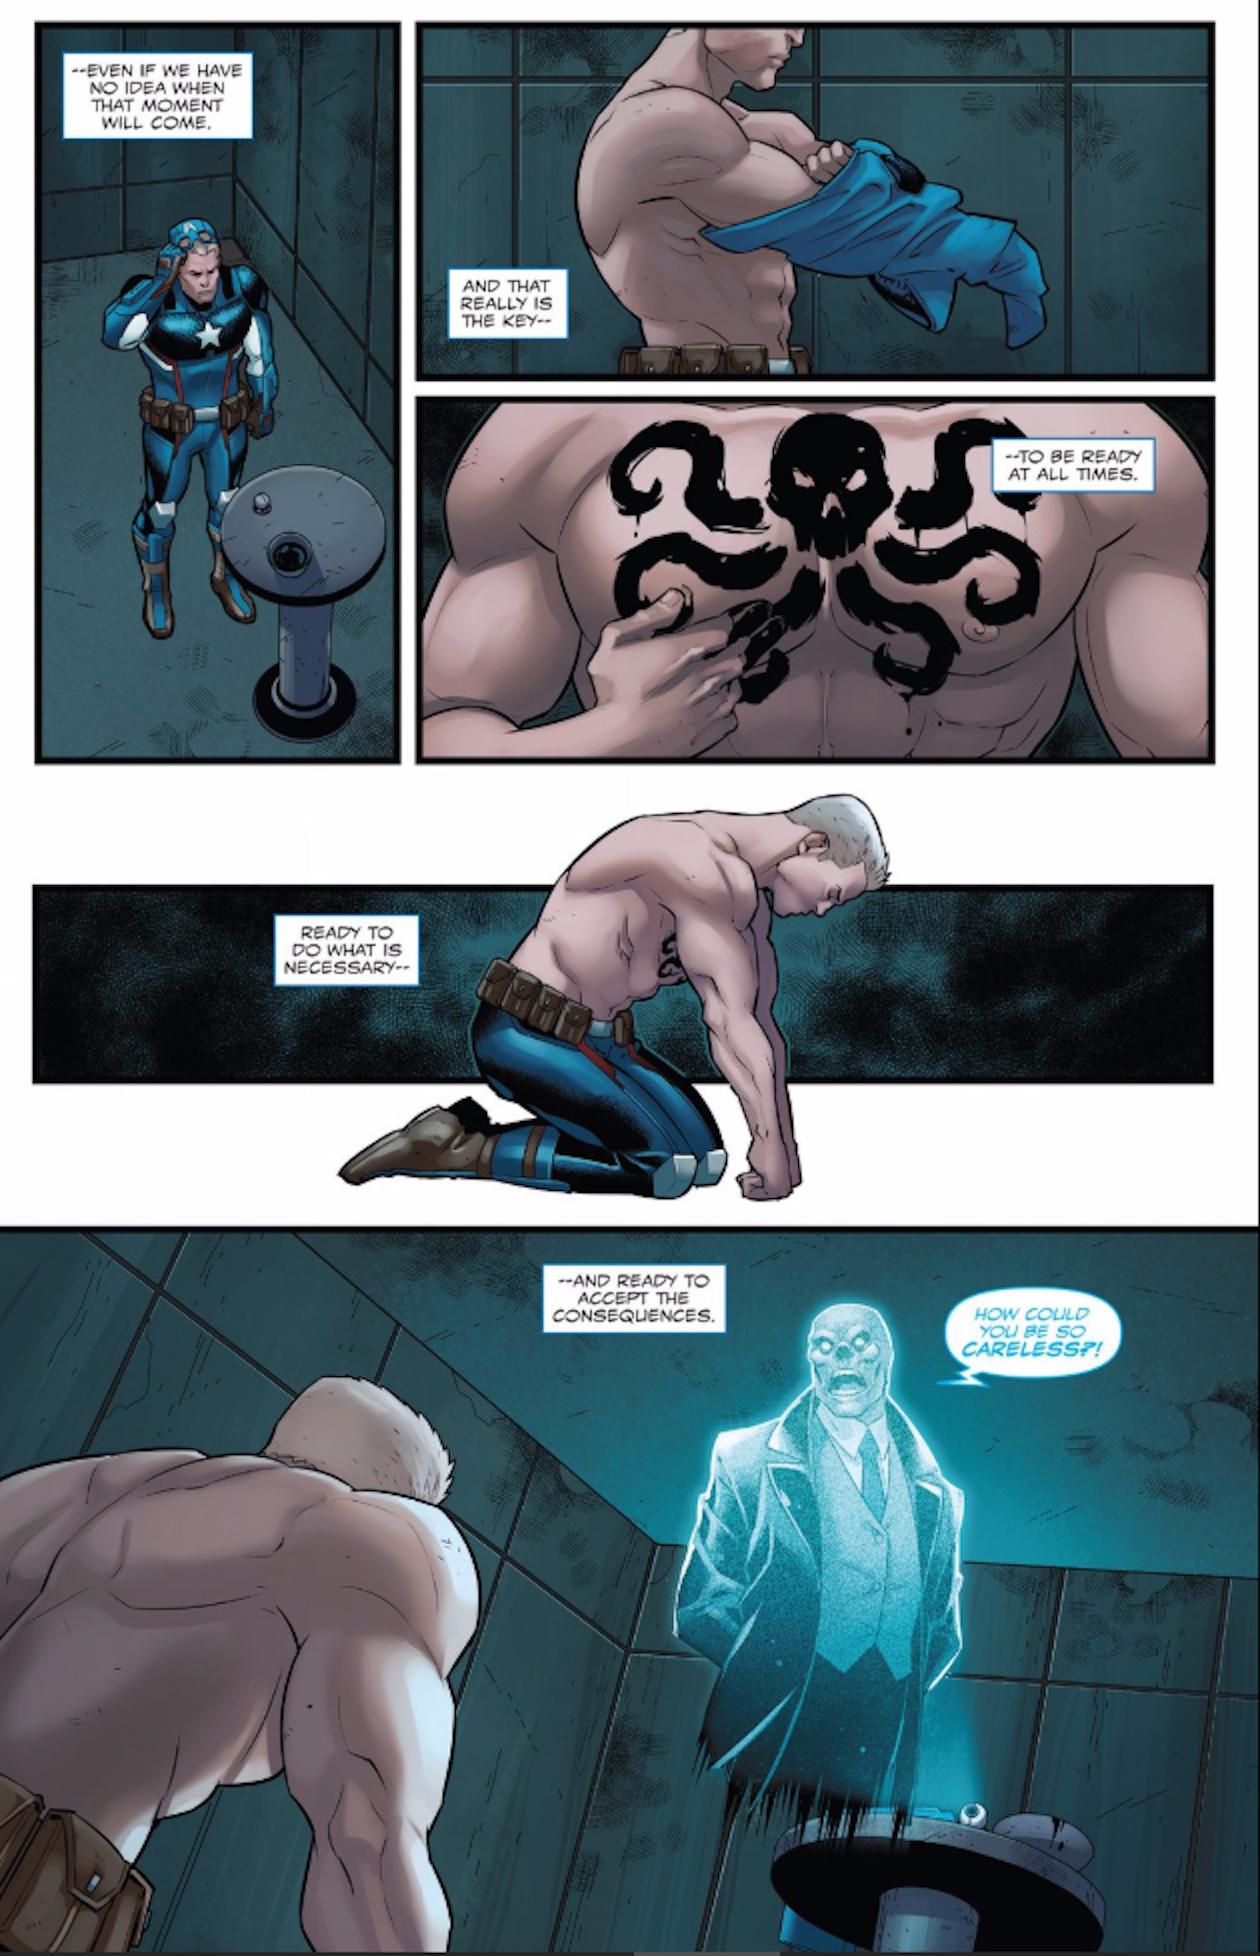 Hydra Nazi Captain America Just Ramped Up His Fascism